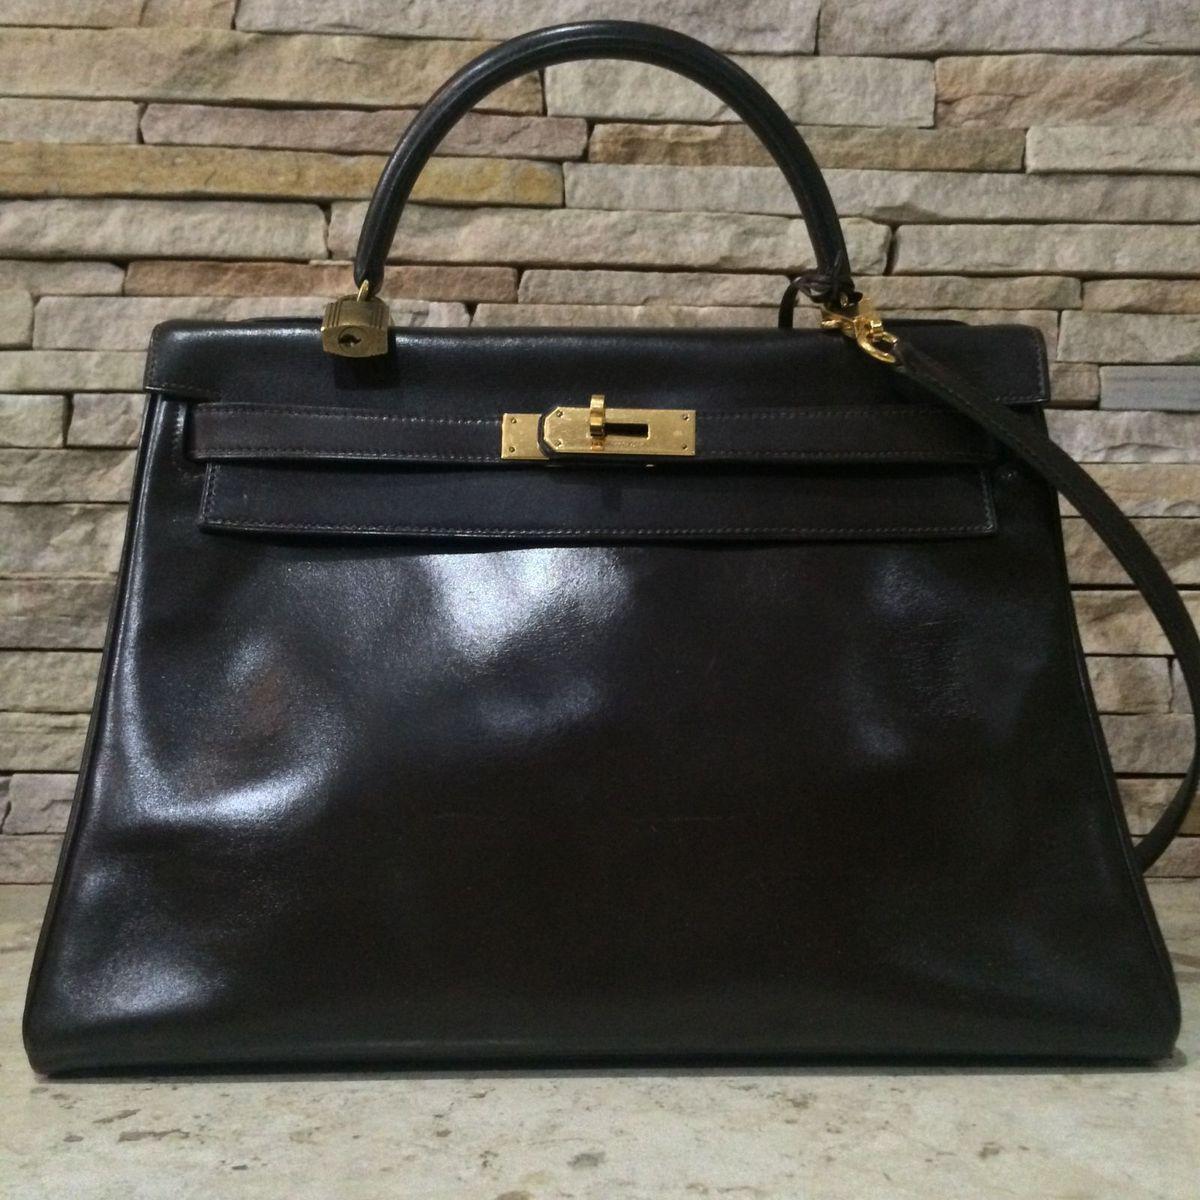 62756517ec1 Bolsa Hermes Kelly 32 Chocolate Gold Original